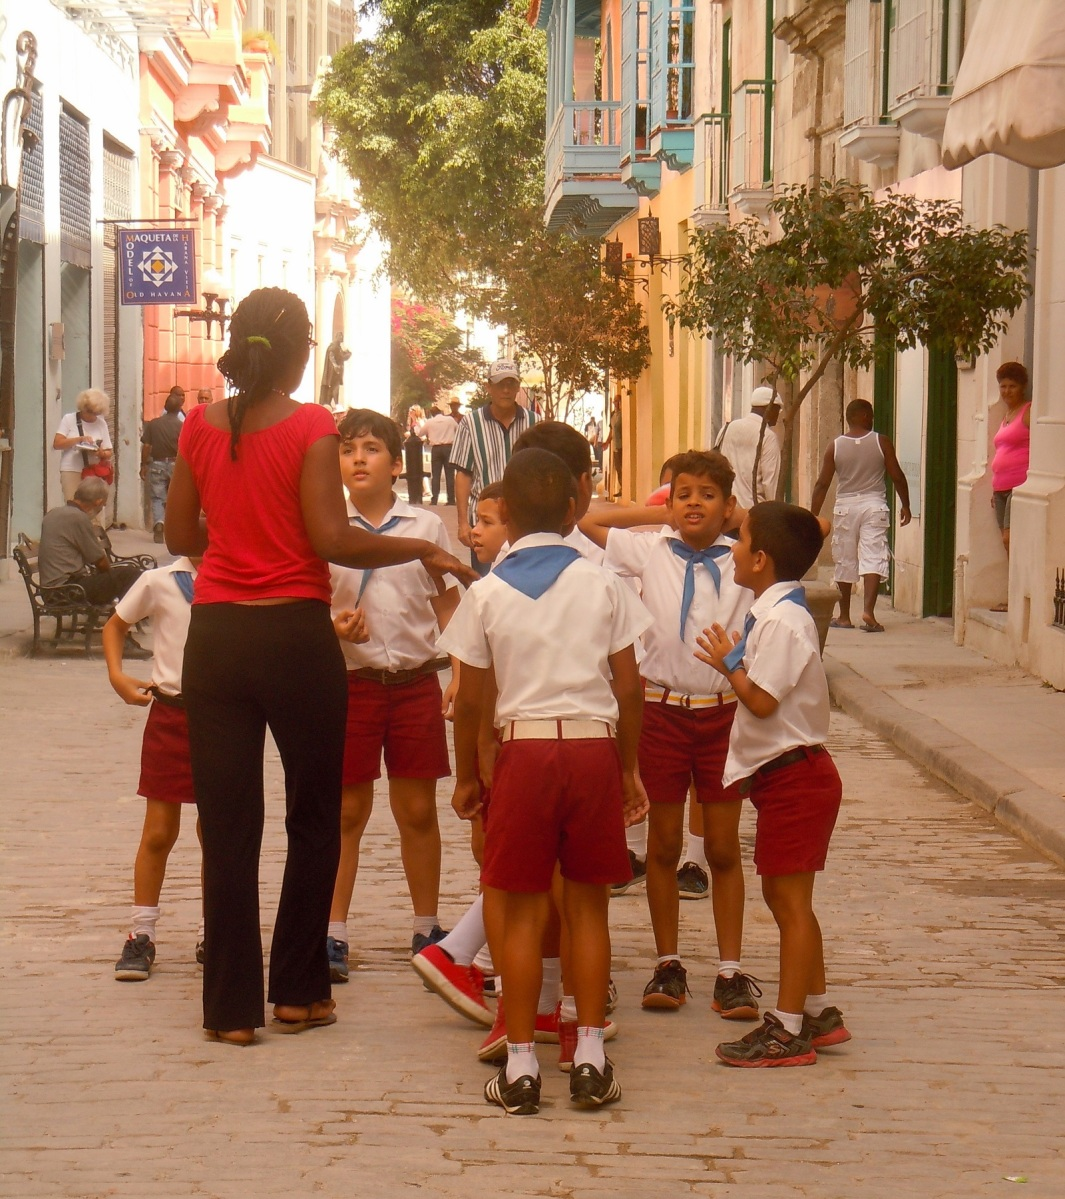 Kids on the street in a restored area of Old Havana.